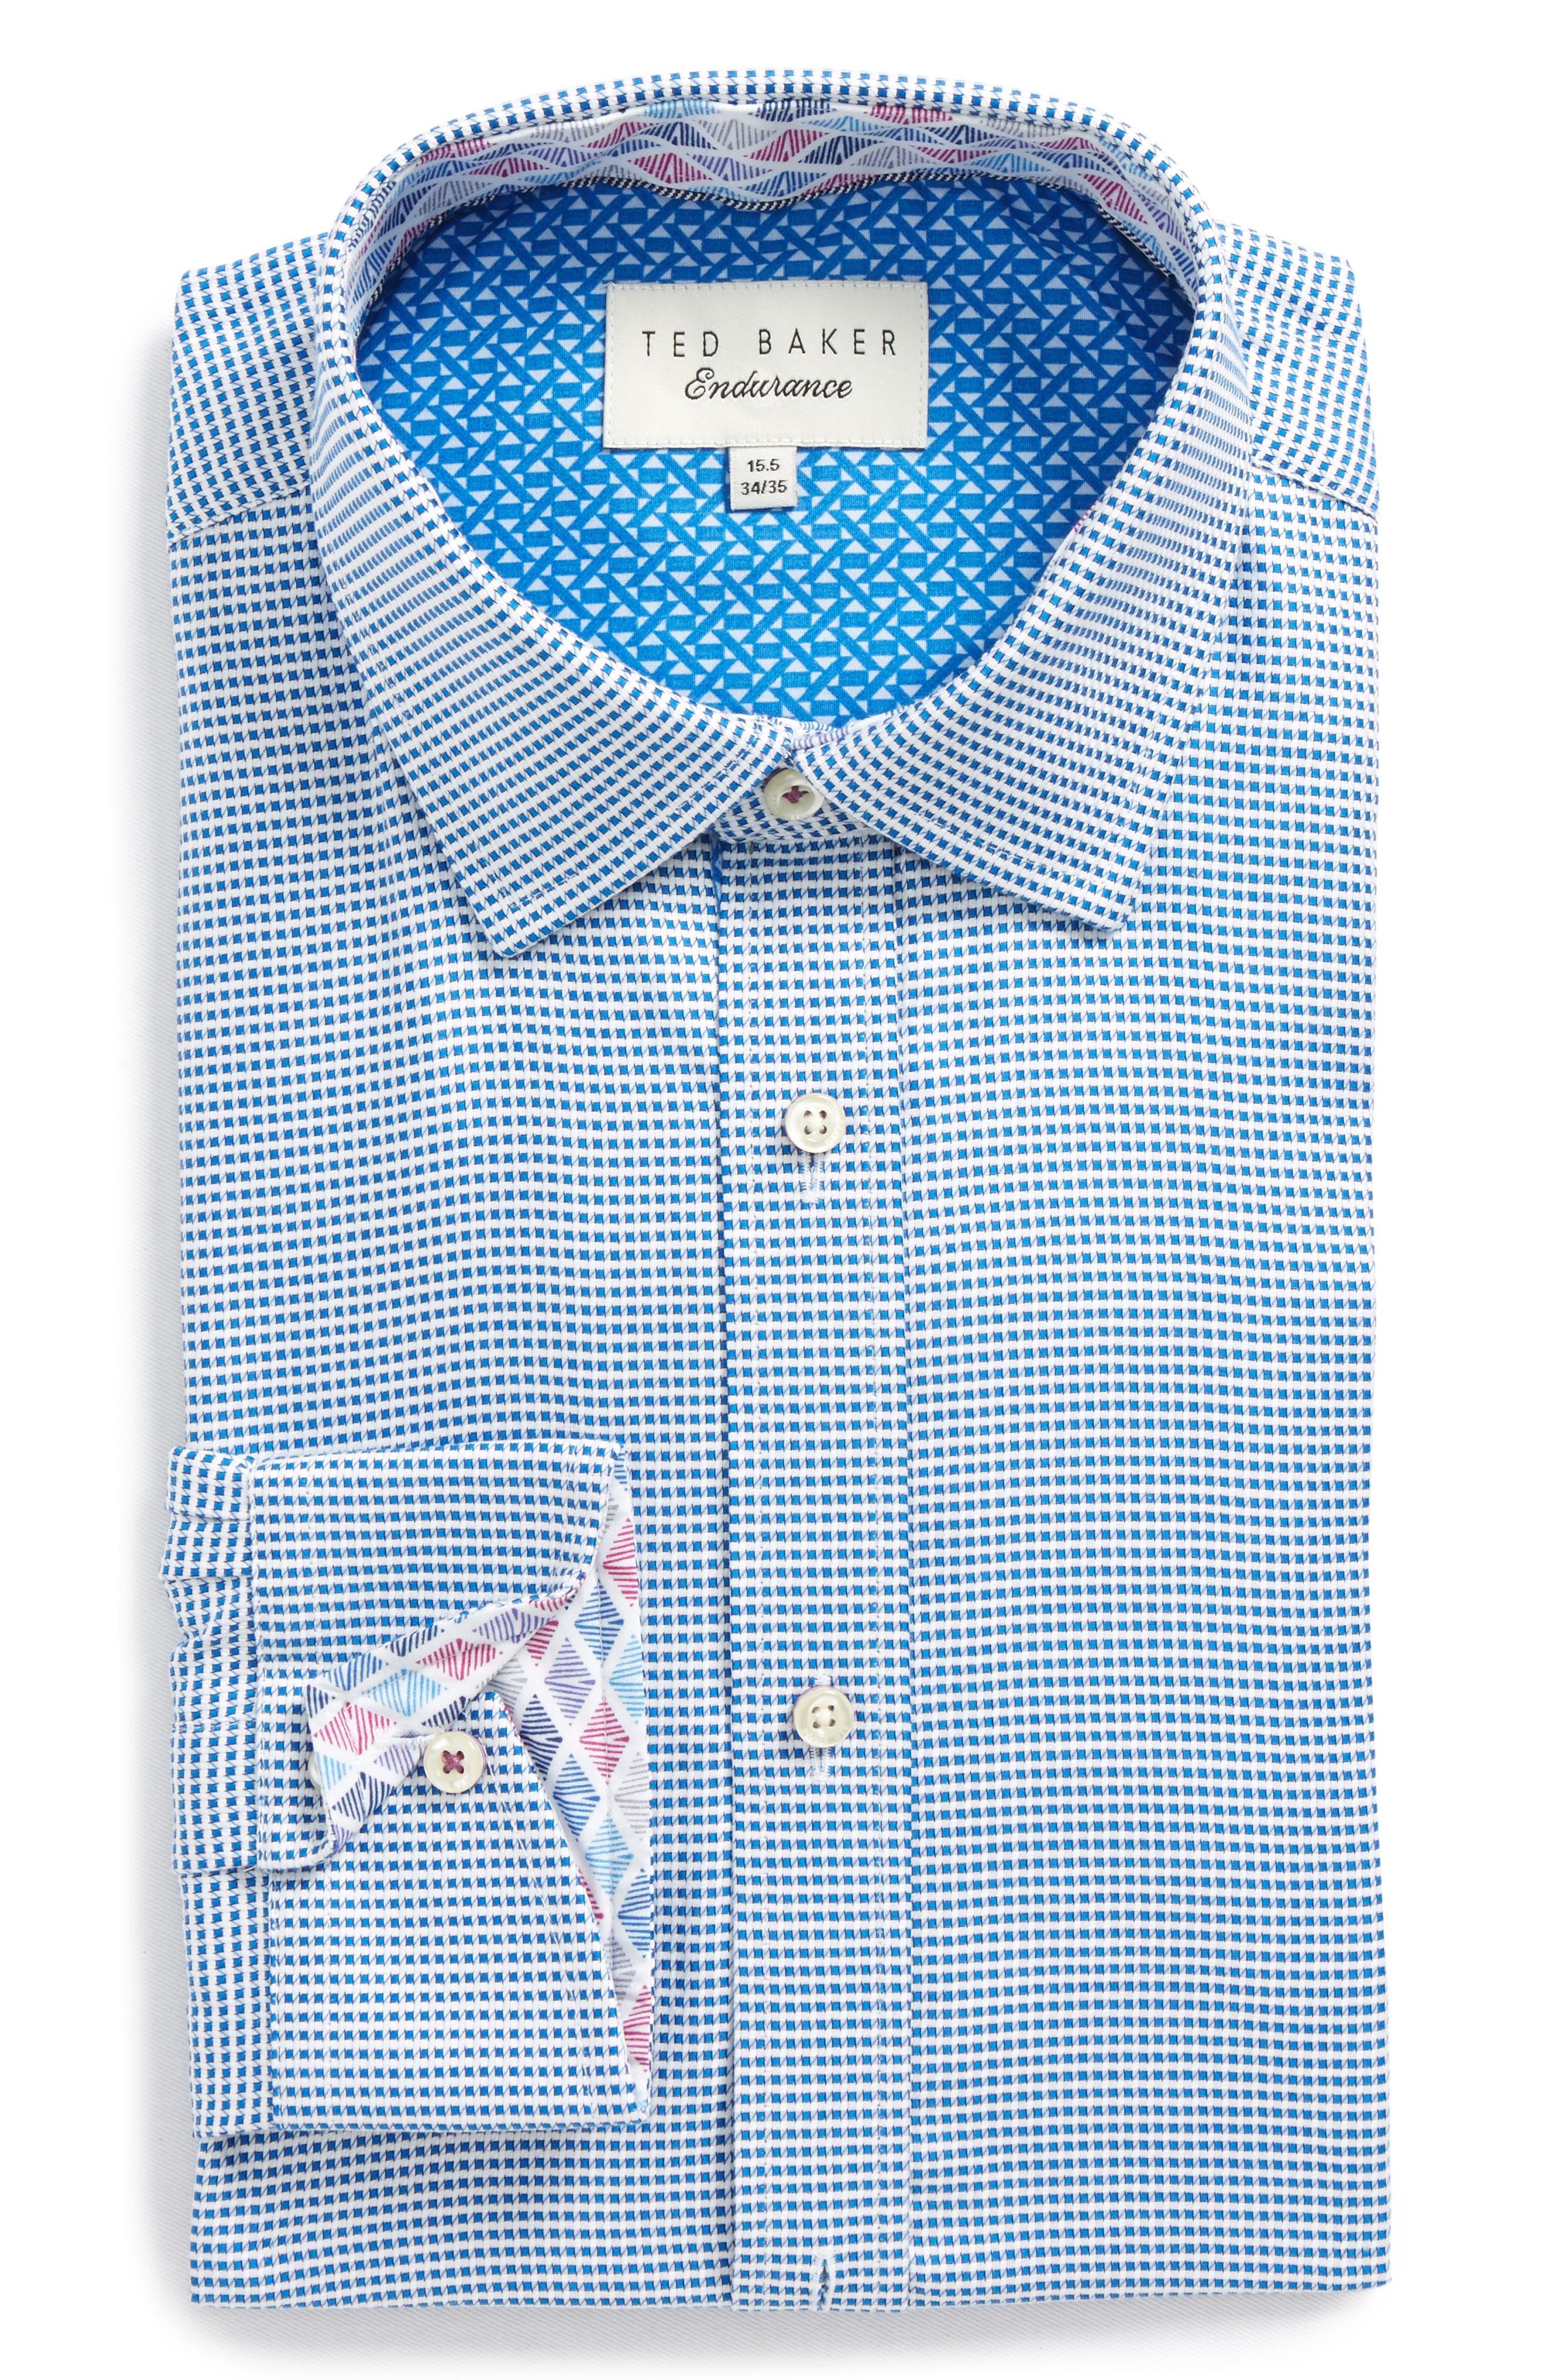 Endurance Giara Trim Fit Dress Shirt,                             Main thumbnail 1, color,                             Blue